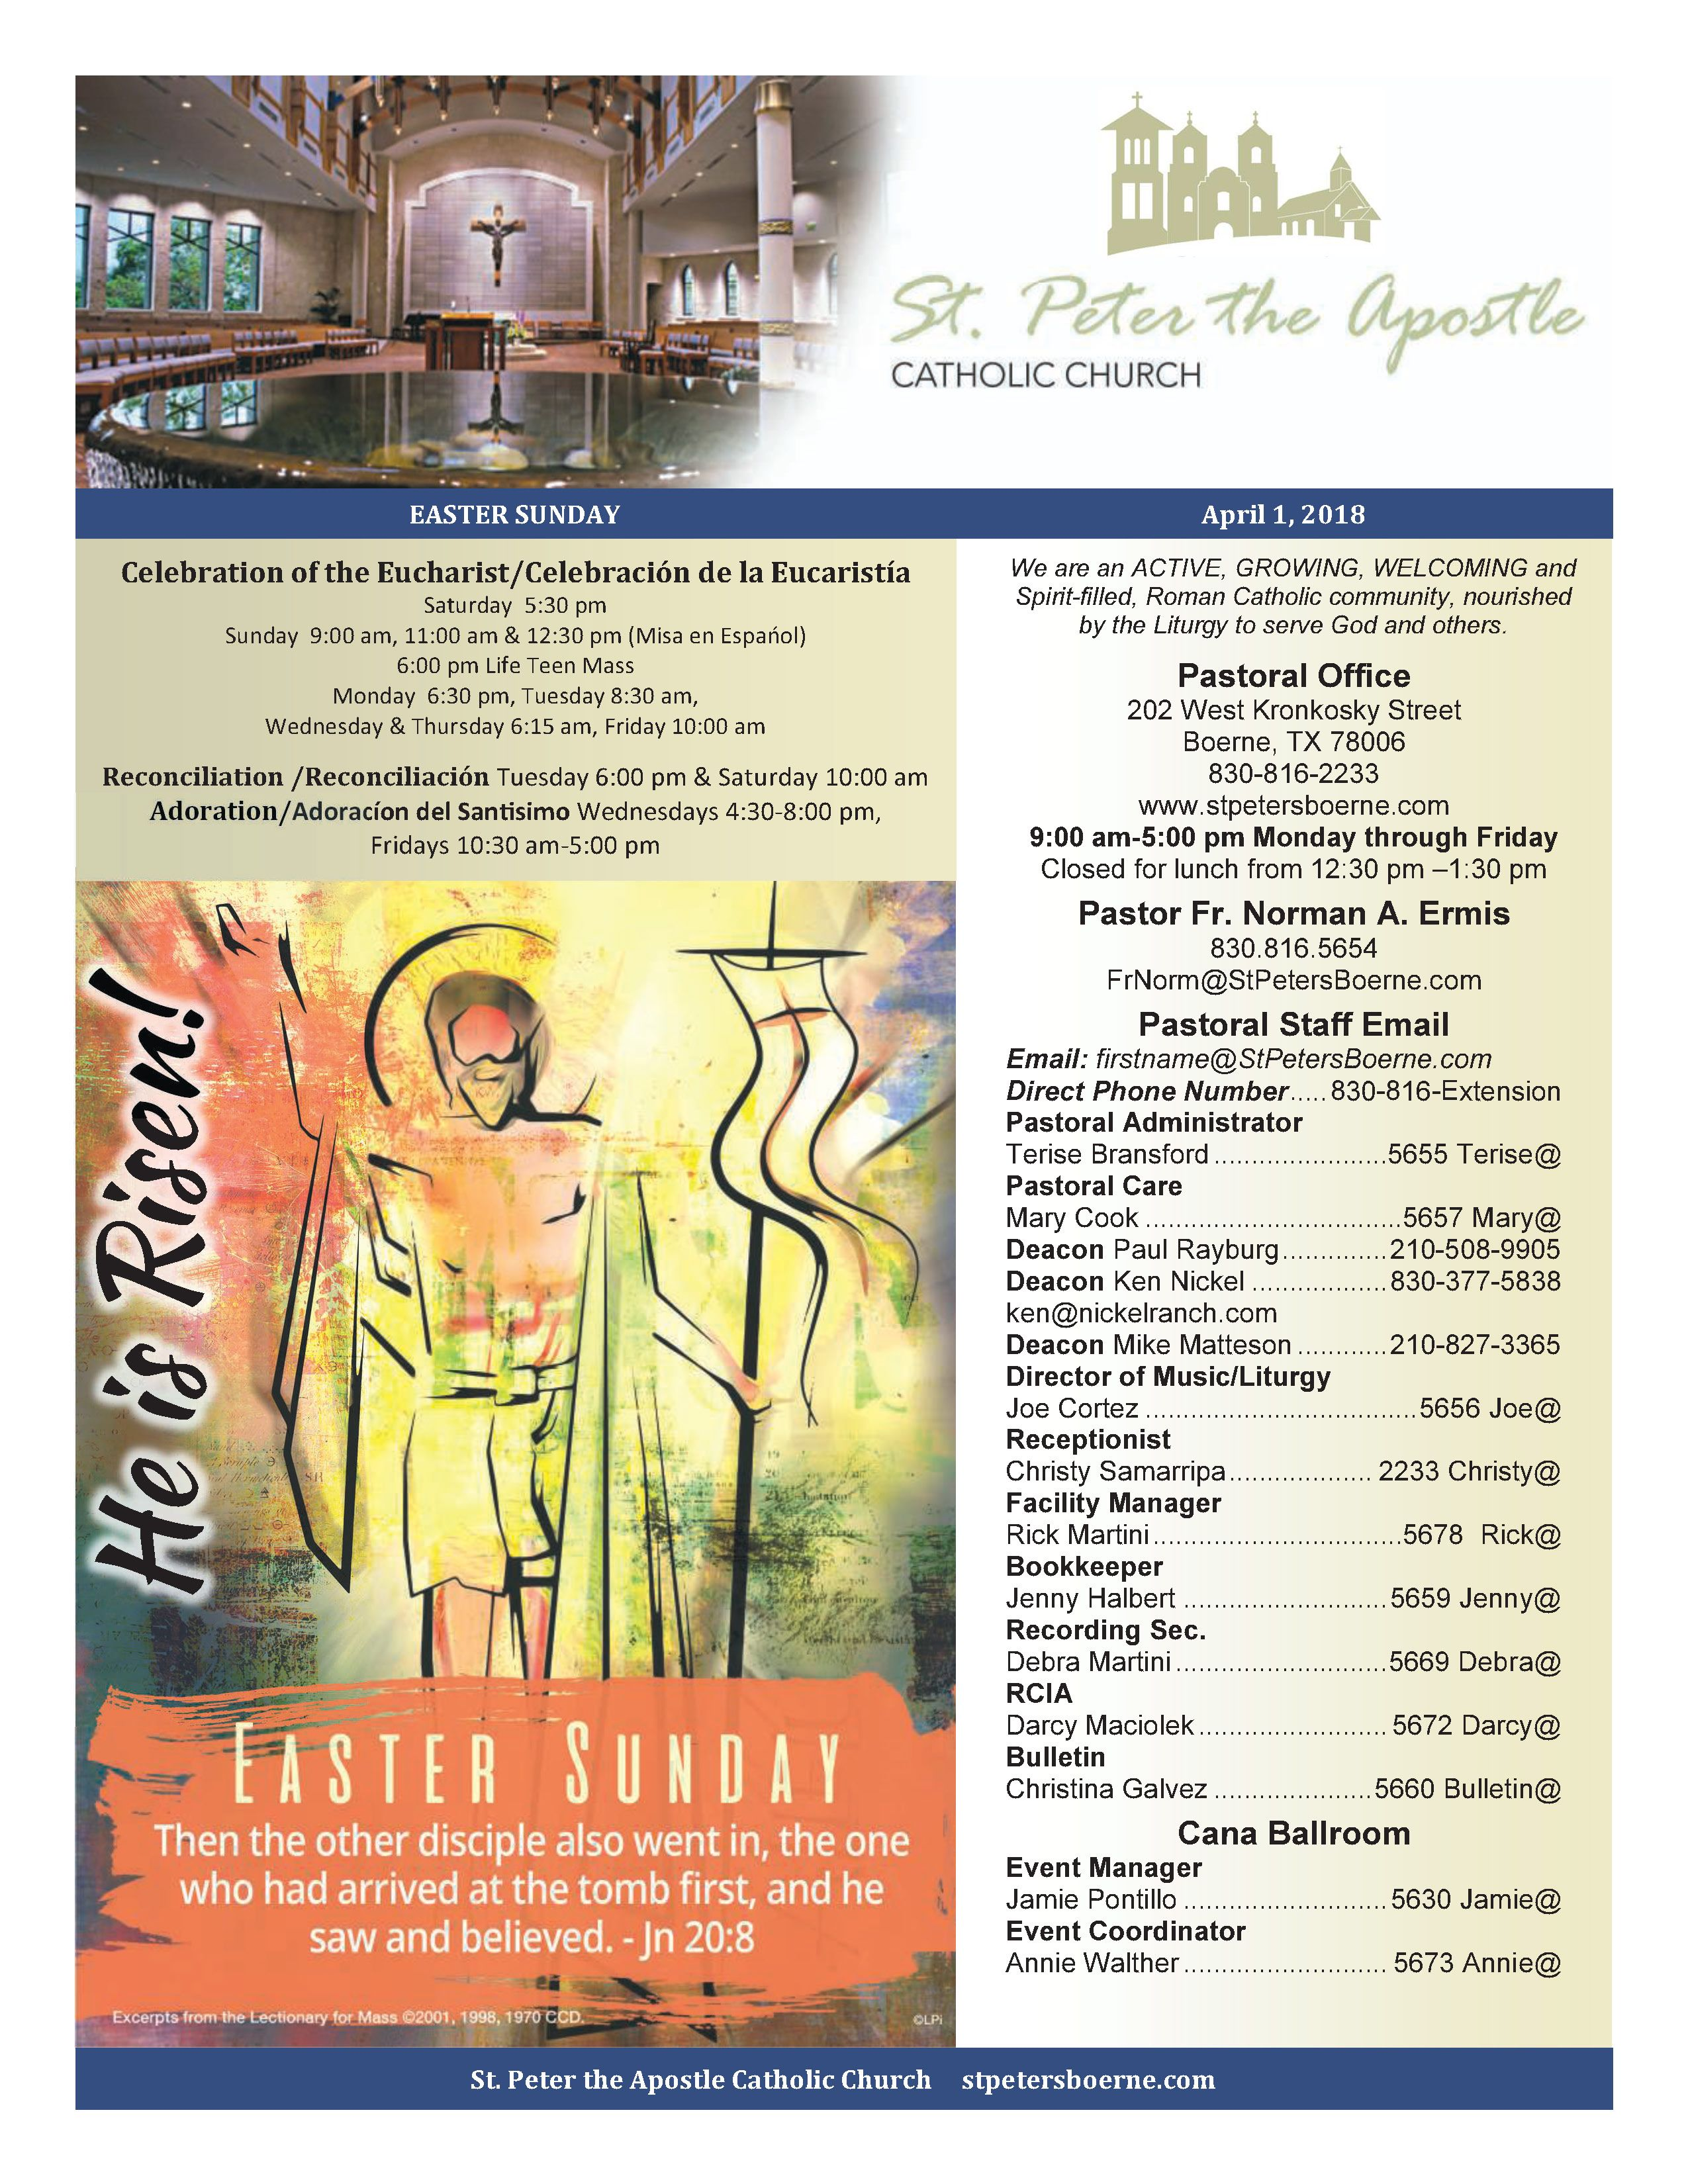 April 1, 2018 Bulletin Eucharist, Easter church, Liturgy